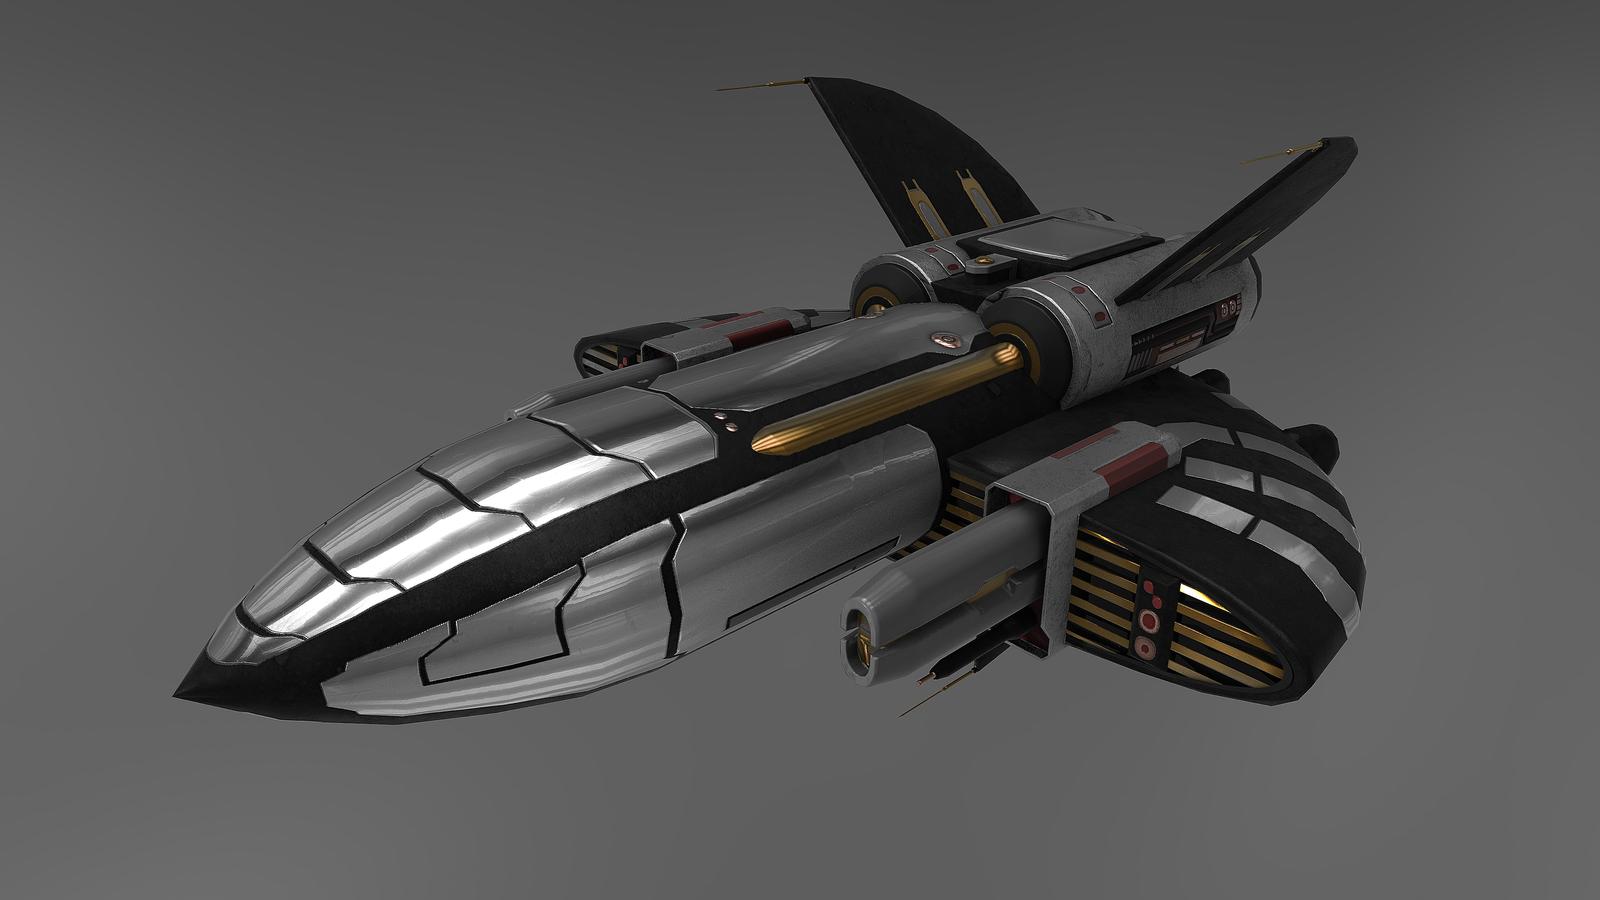 Spaceship Drone 06 By Berandas